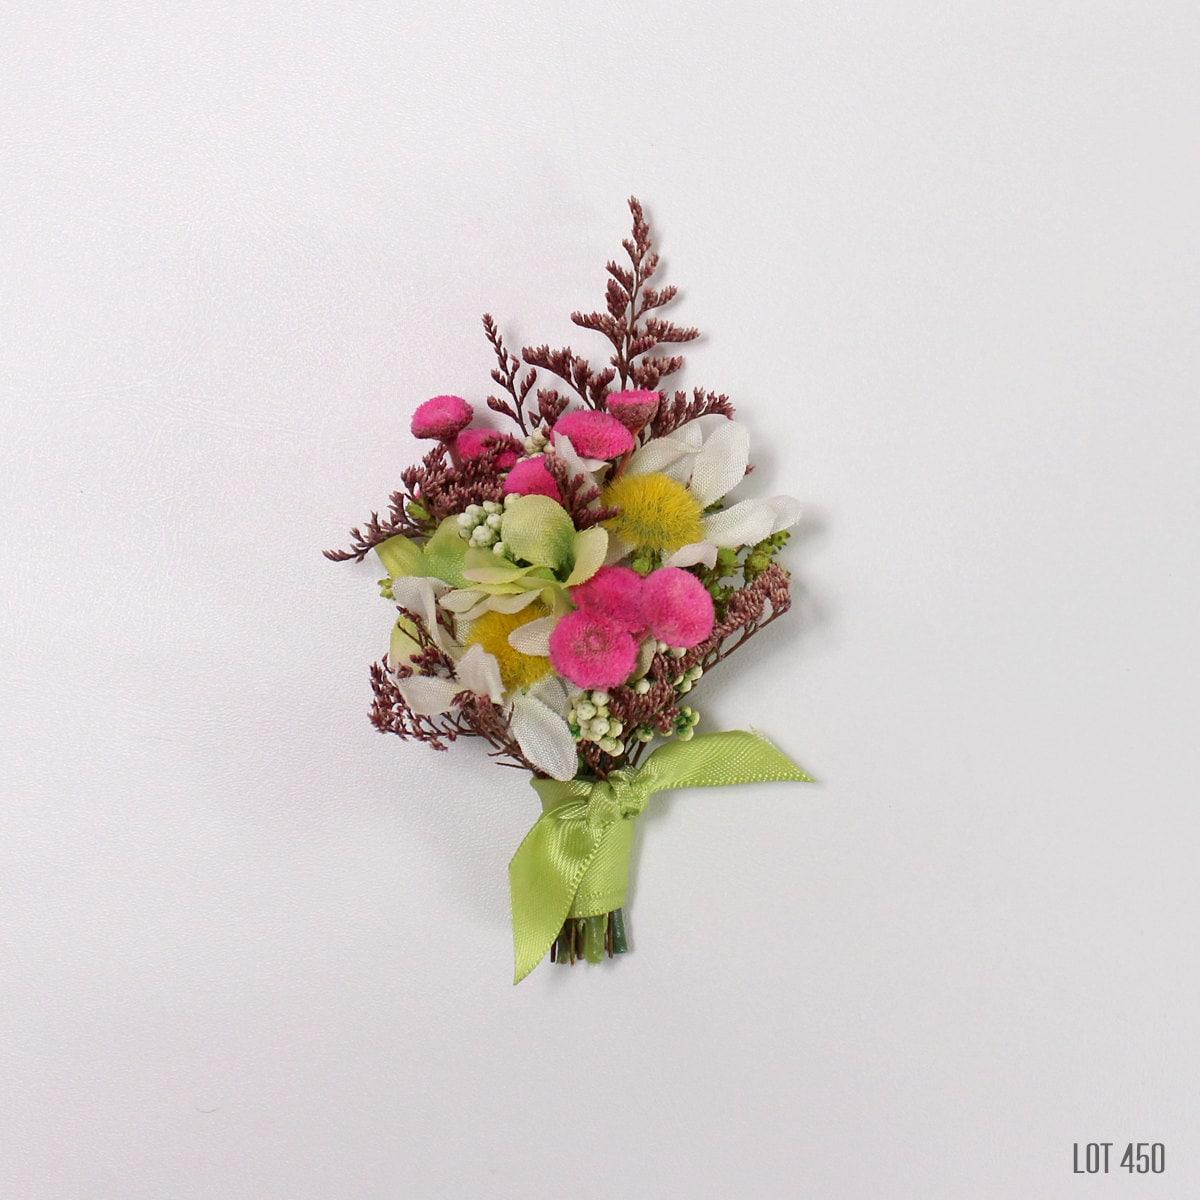 Wedding Flowers Men: Boutonniere Spring Mix Flowers For Men Wedding Groom Best